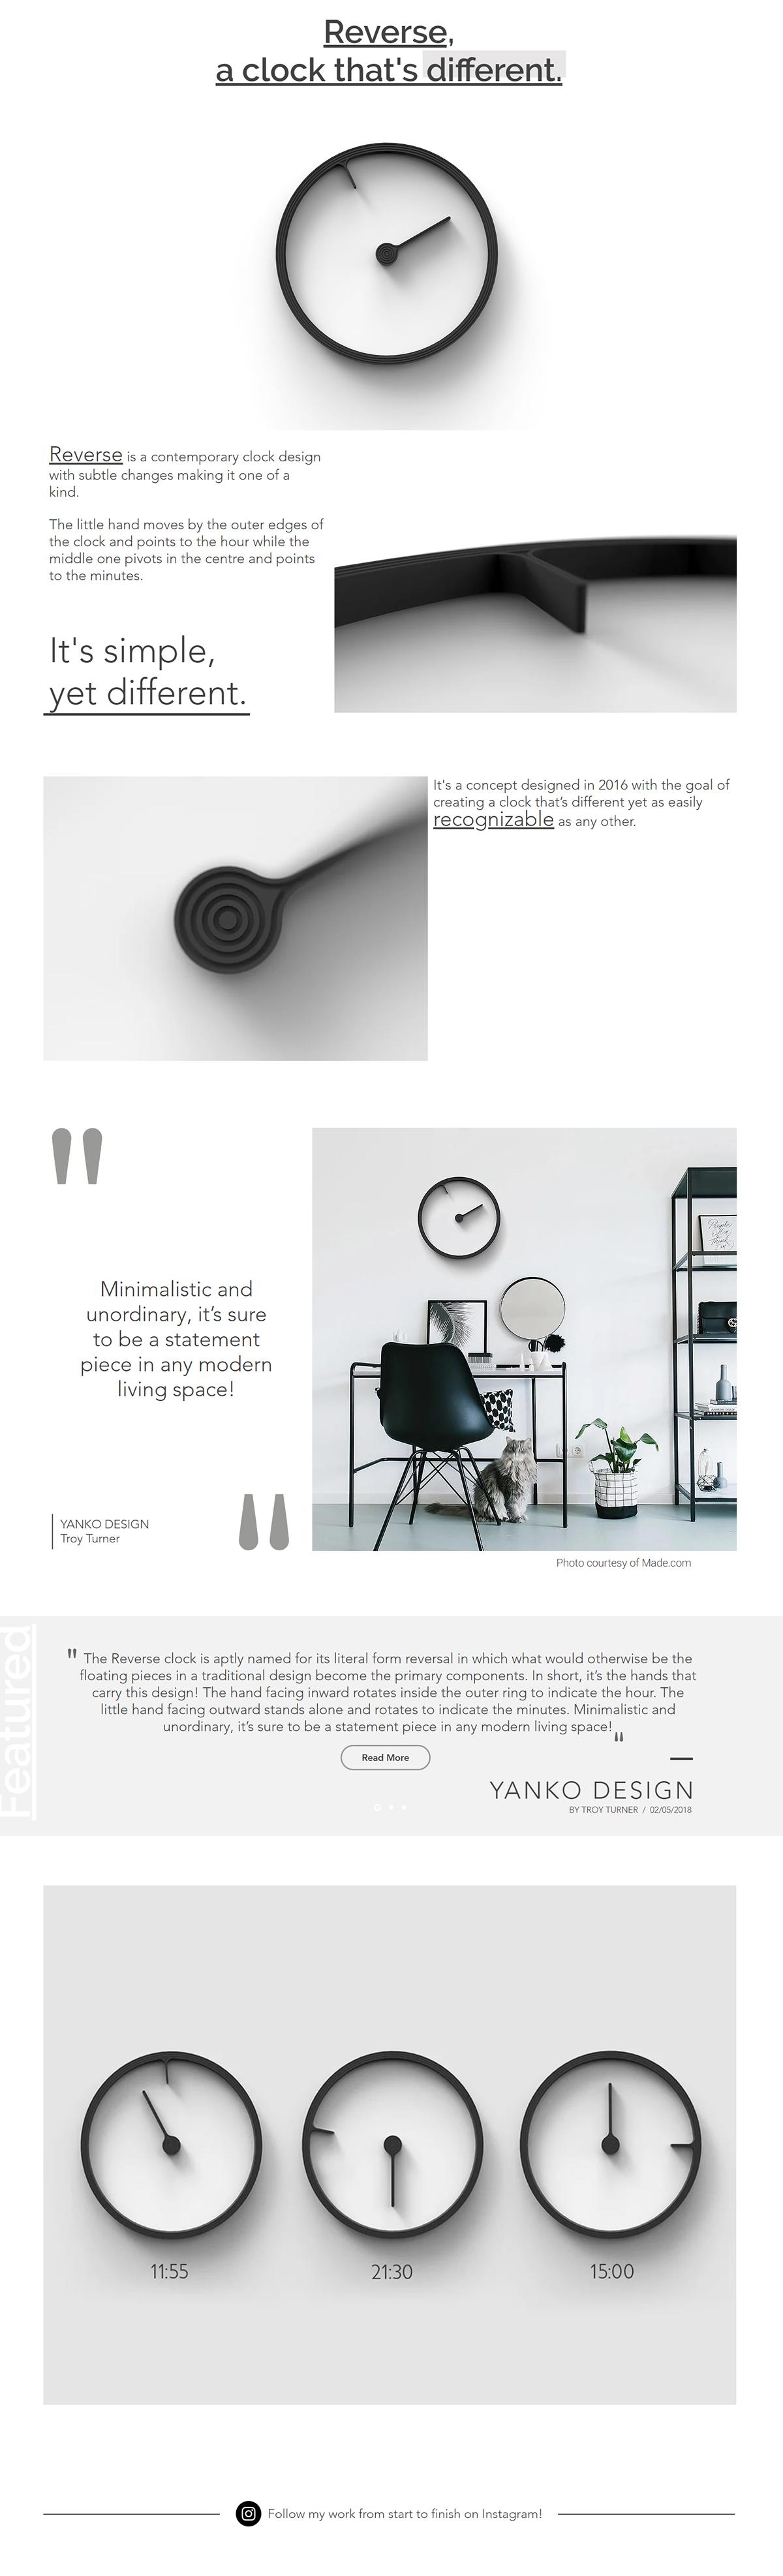 Reverse mattice boets clock contemporary Interior design Marble different subtle